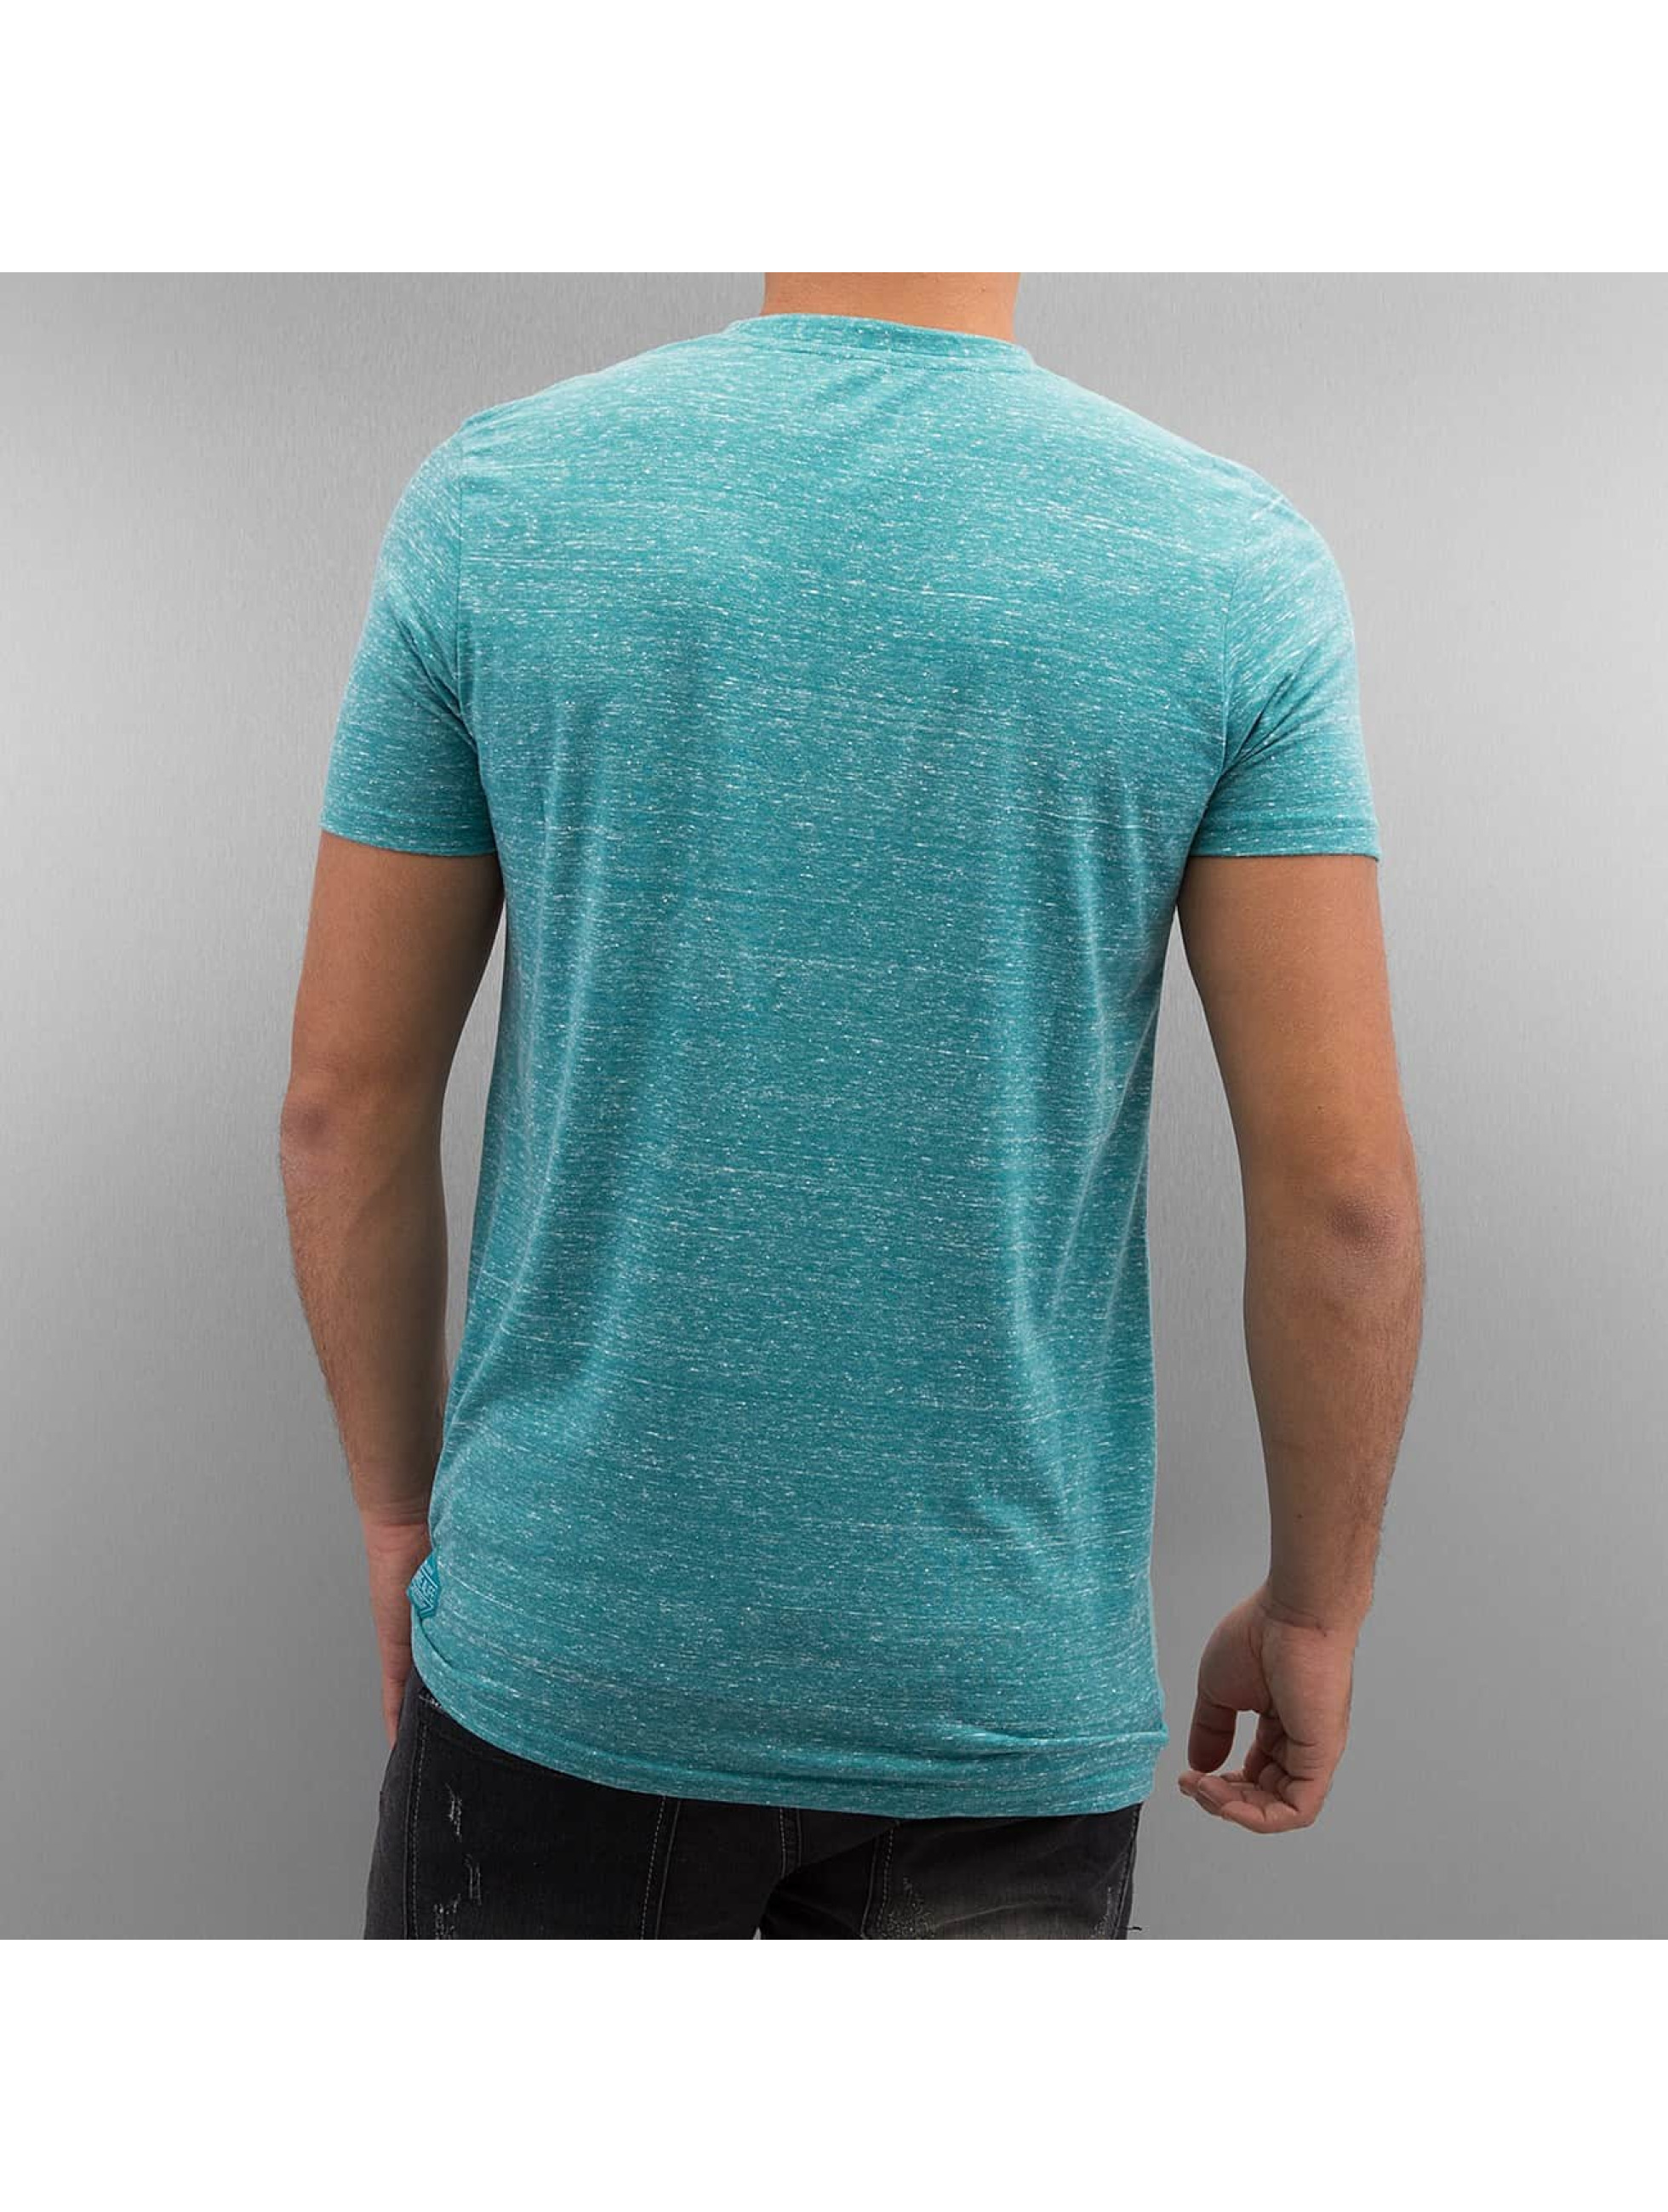 Alife & Kickin T-Shirt Vin A turquoise